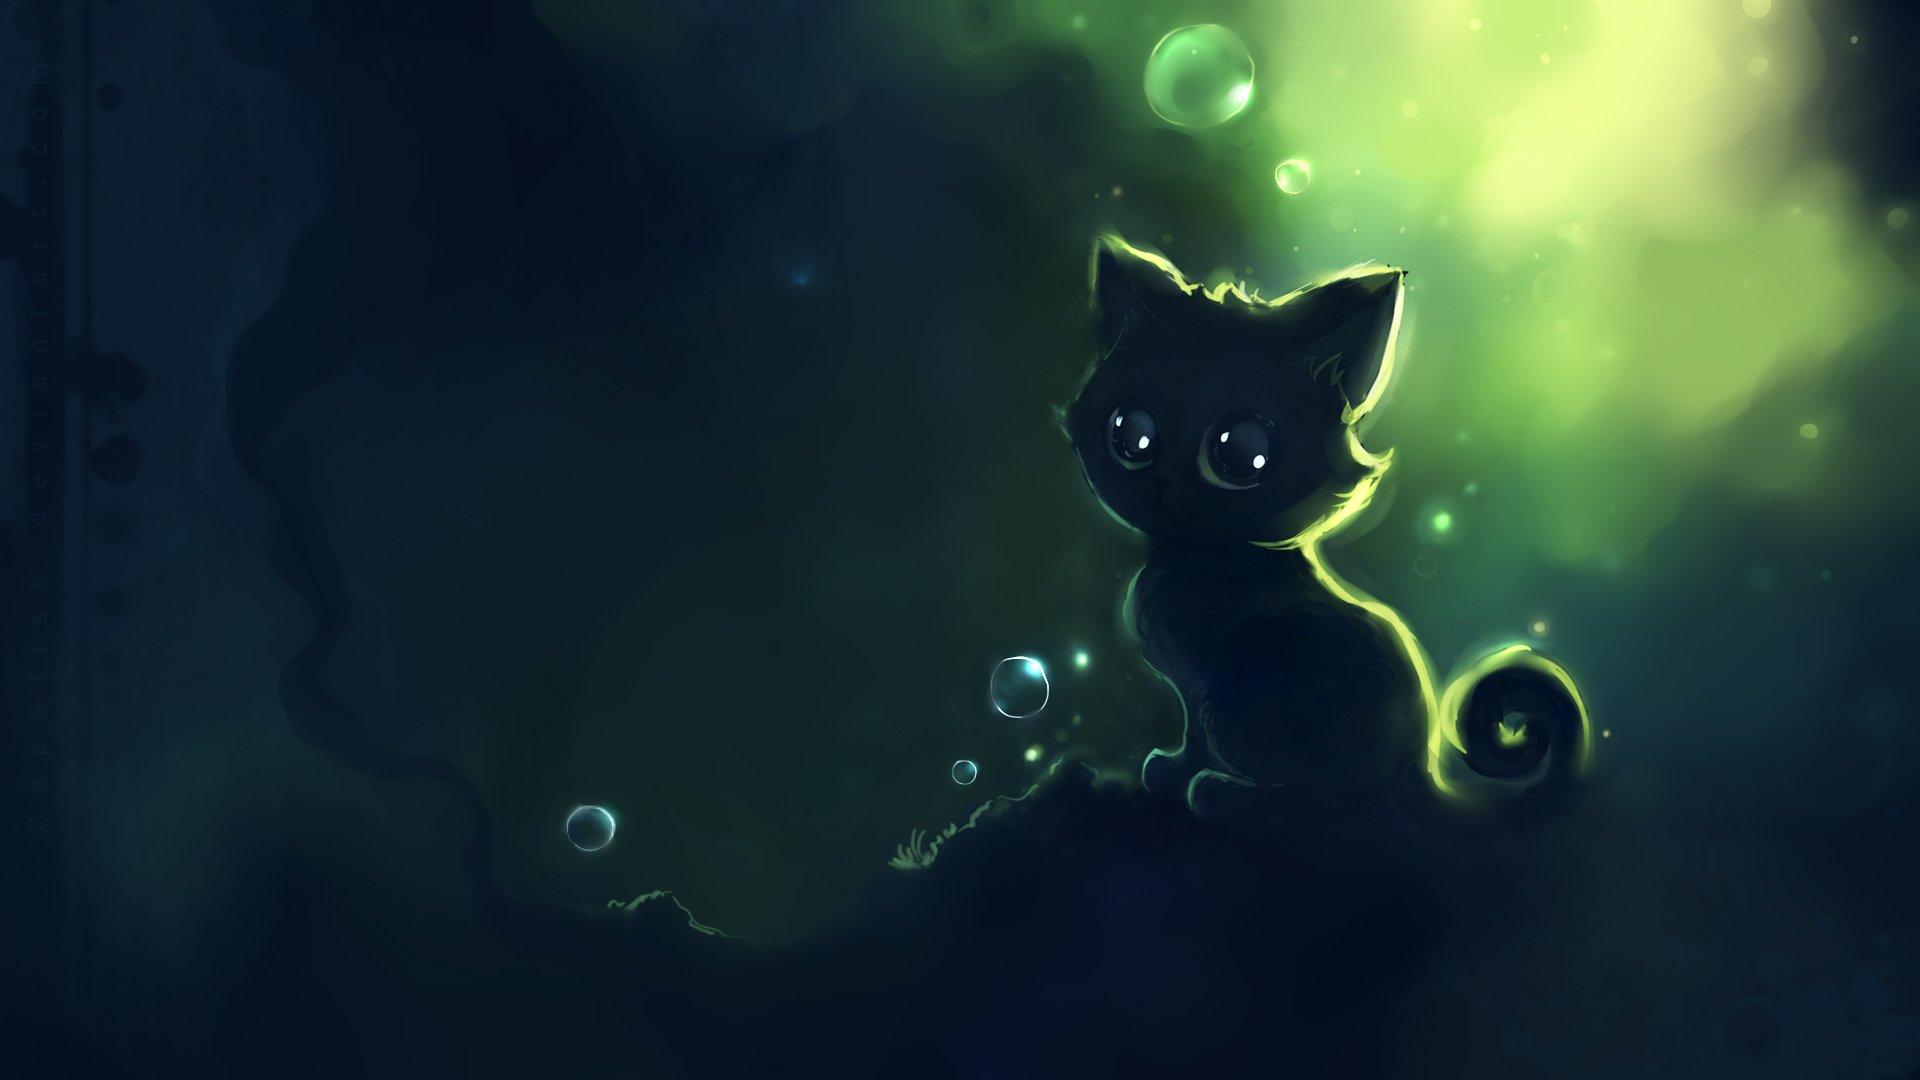 30+ Anime Cat Wallpaper by Judit Mowett, GoldWallpapers